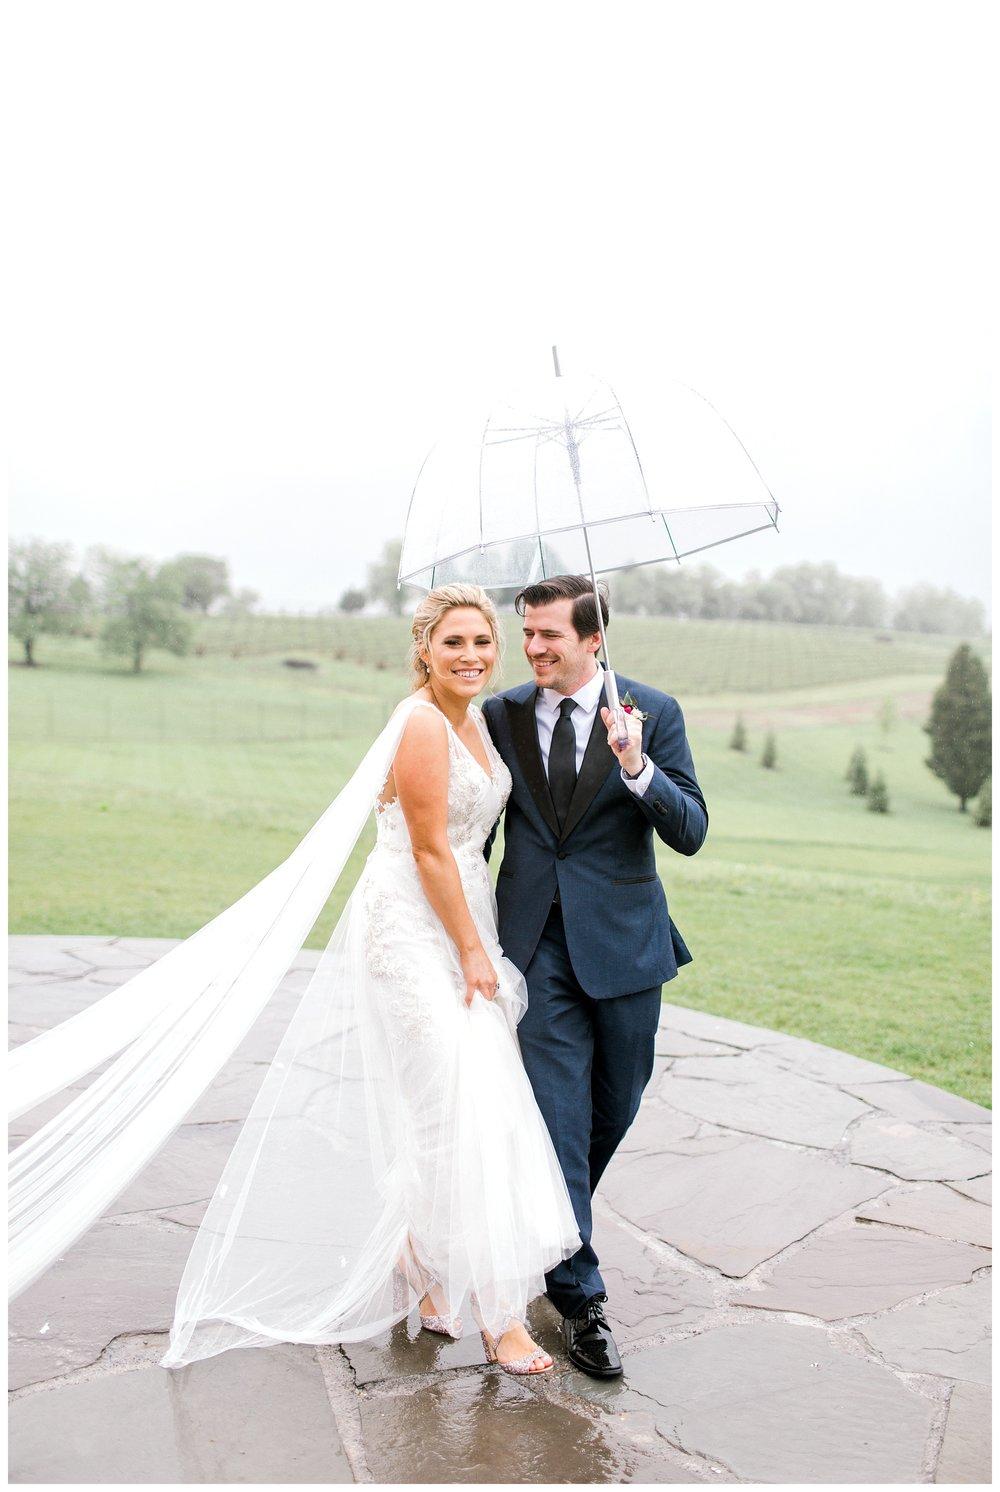 Stone Tower Winery Wedding Virginia Wedding Photographer_0052.jpg